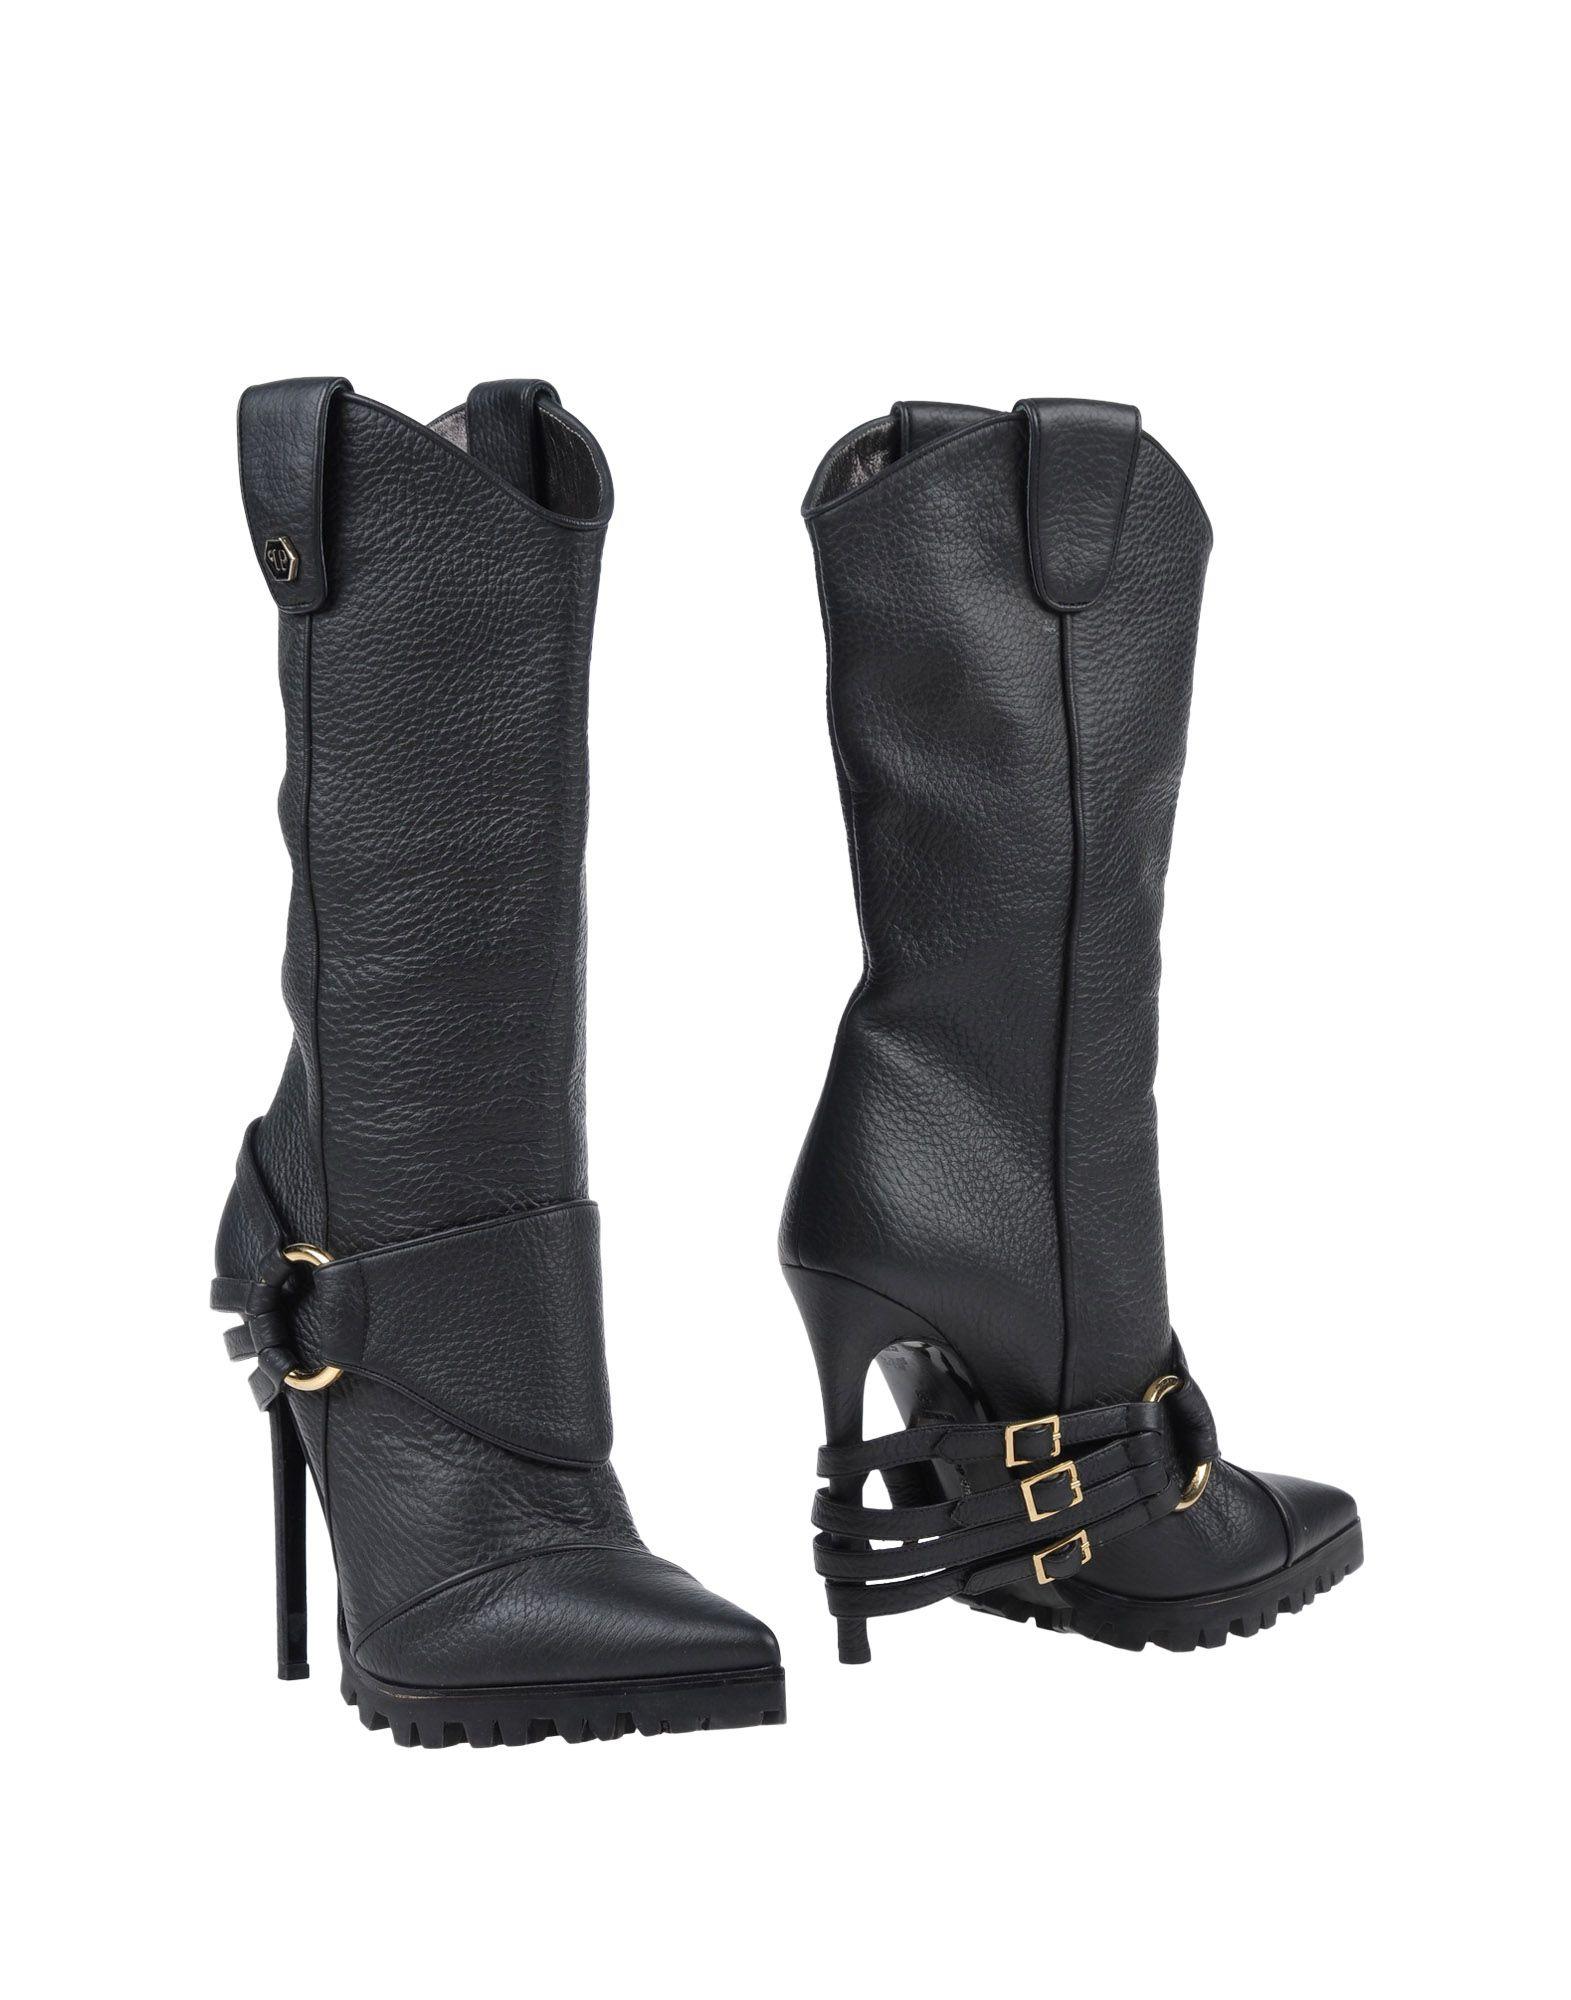 Philipp Plein Ankle Boot Ankle - Women Philipp Plein Ankle Boot Boots online on  Australia - 11407997RP dd1a94